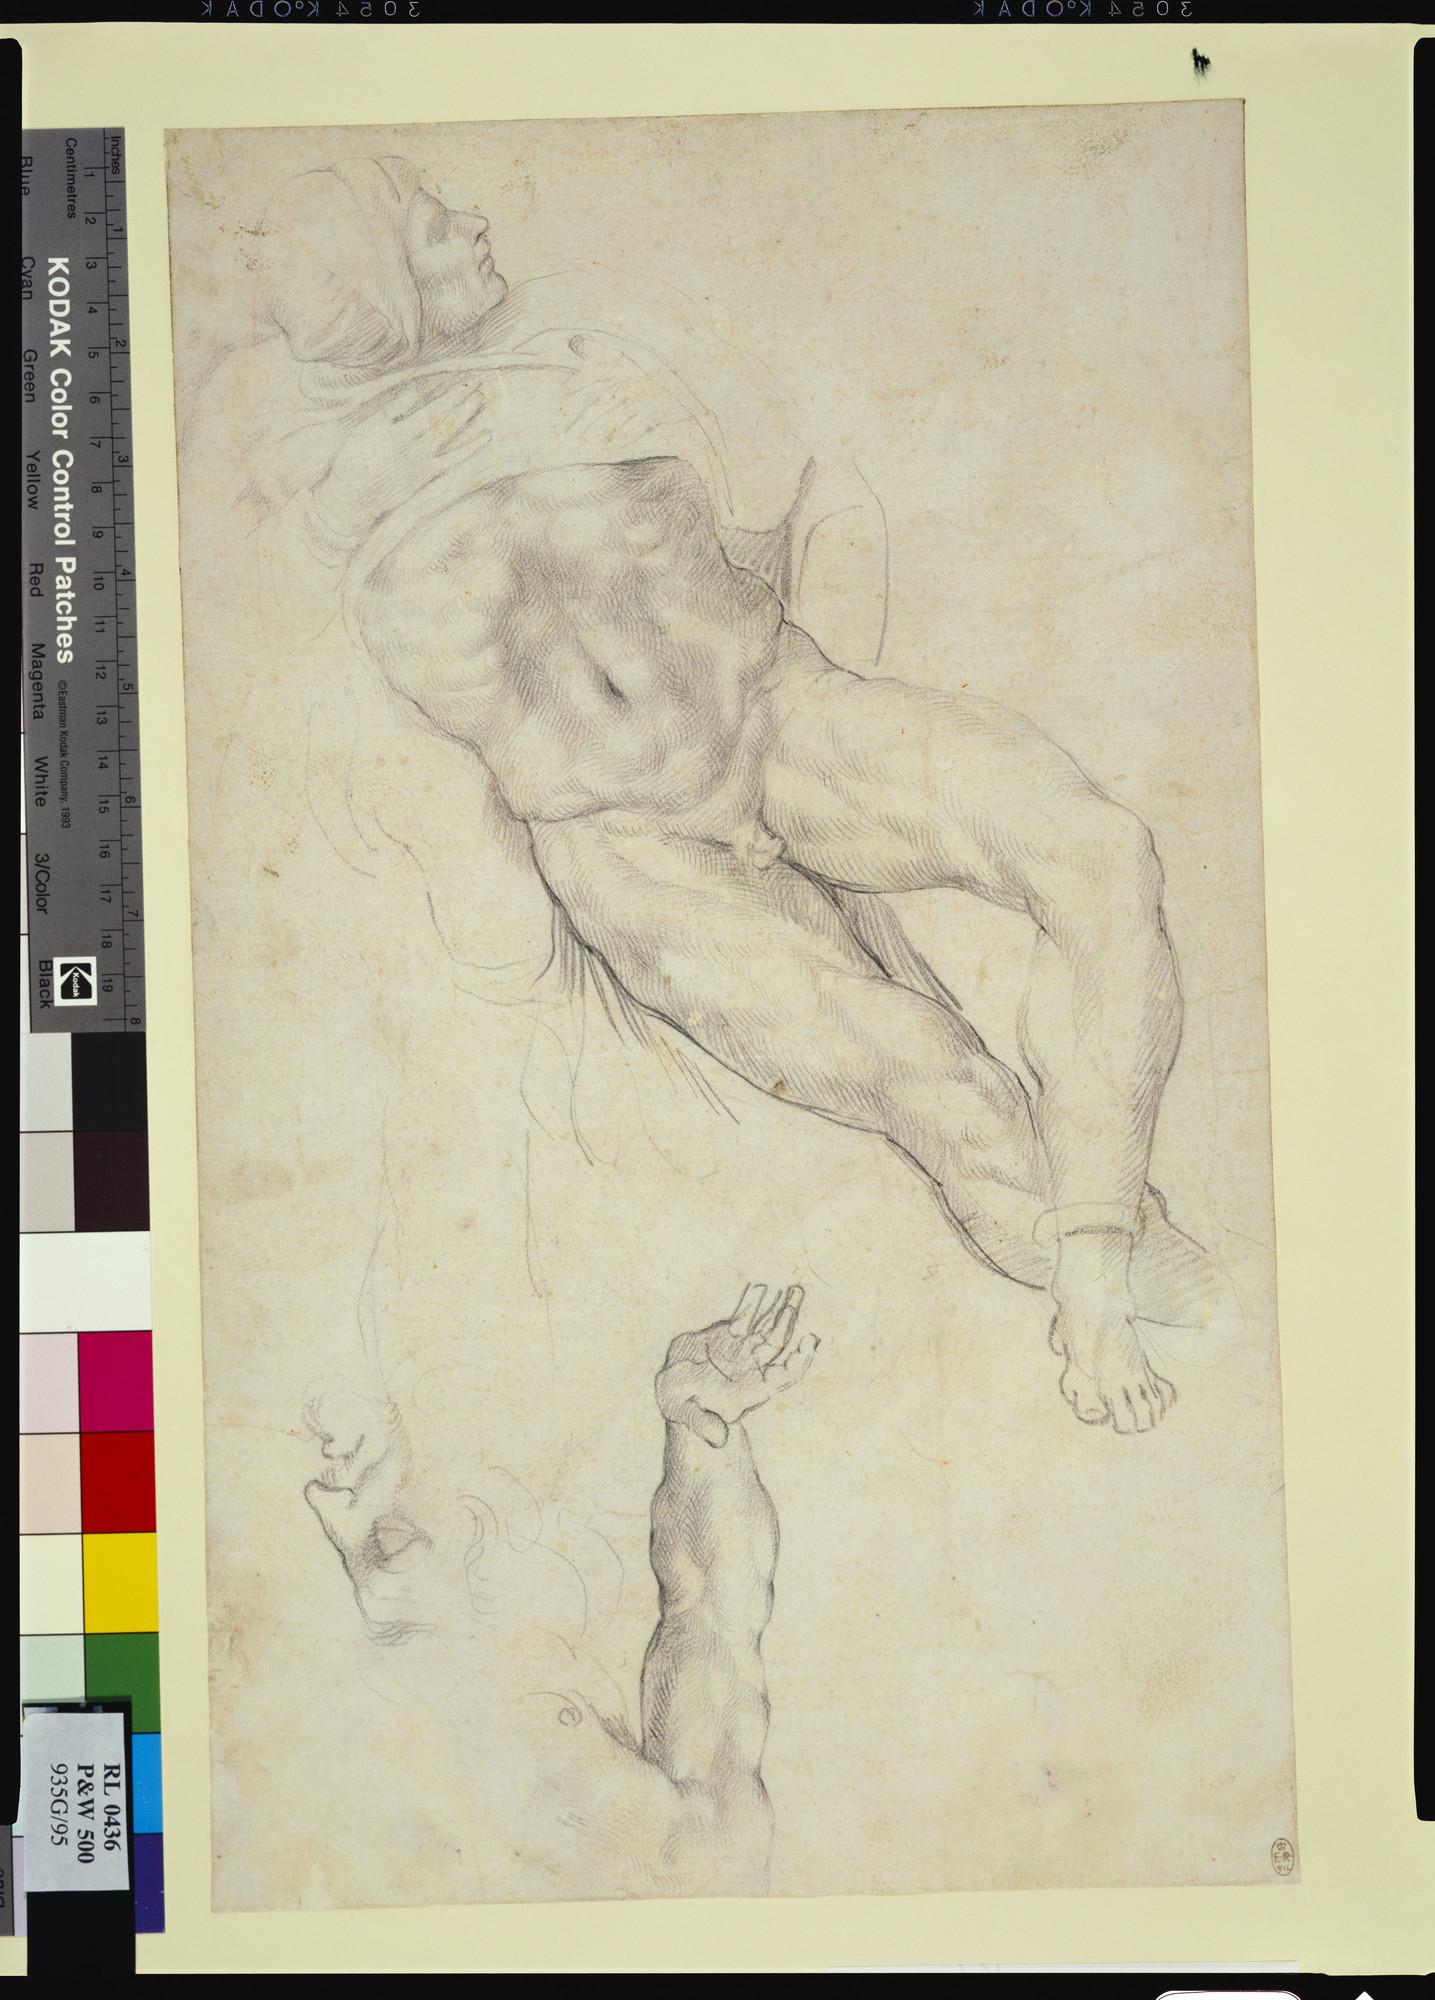 Michelangelo Buonarroti (Caprese 1475-Rome 1564) - [node